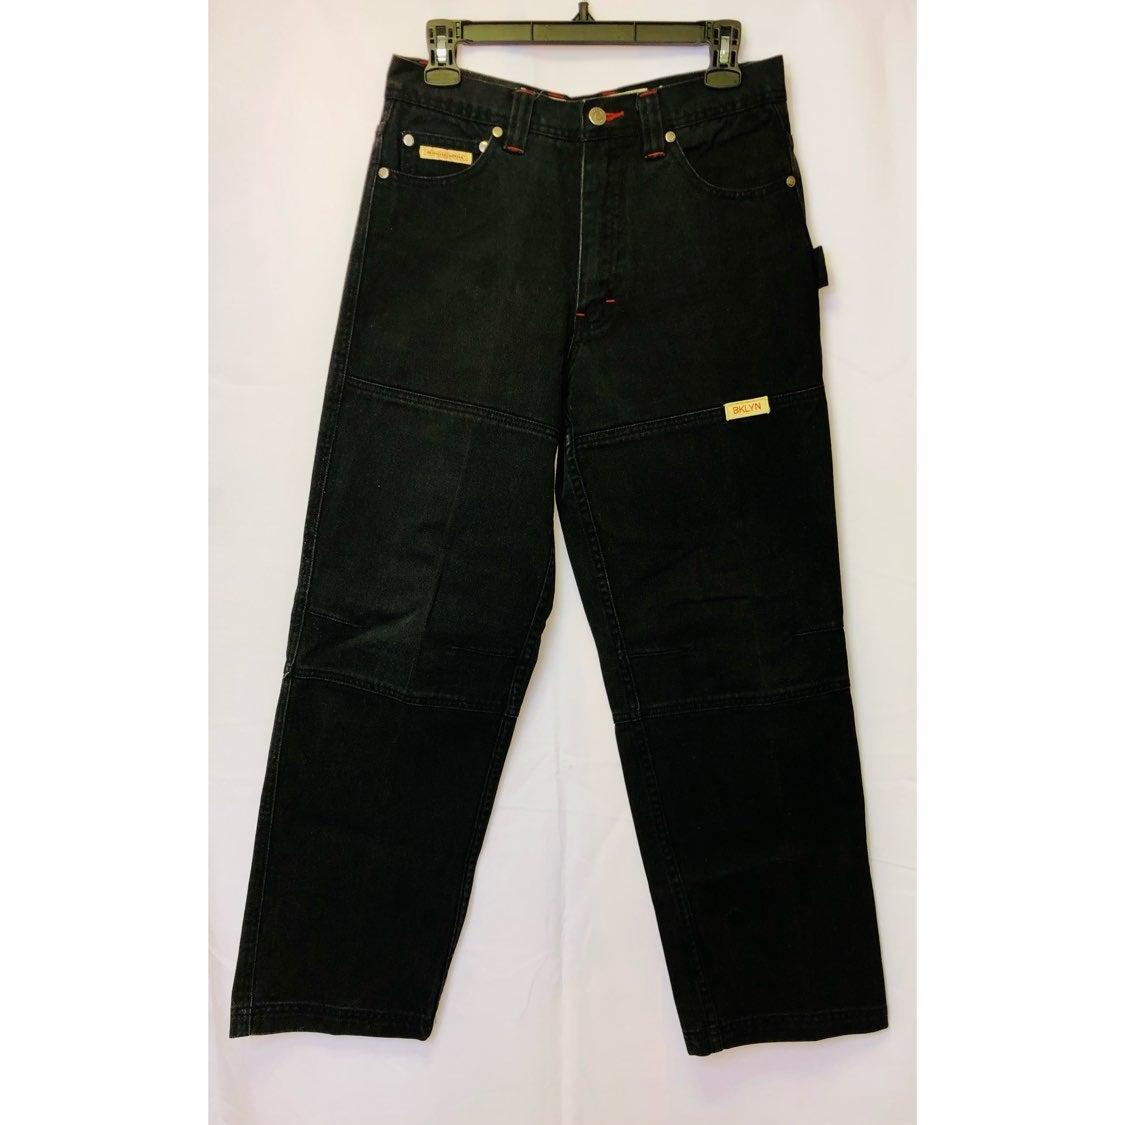 Brooklyn Xpress Vintage High Waist Jeans